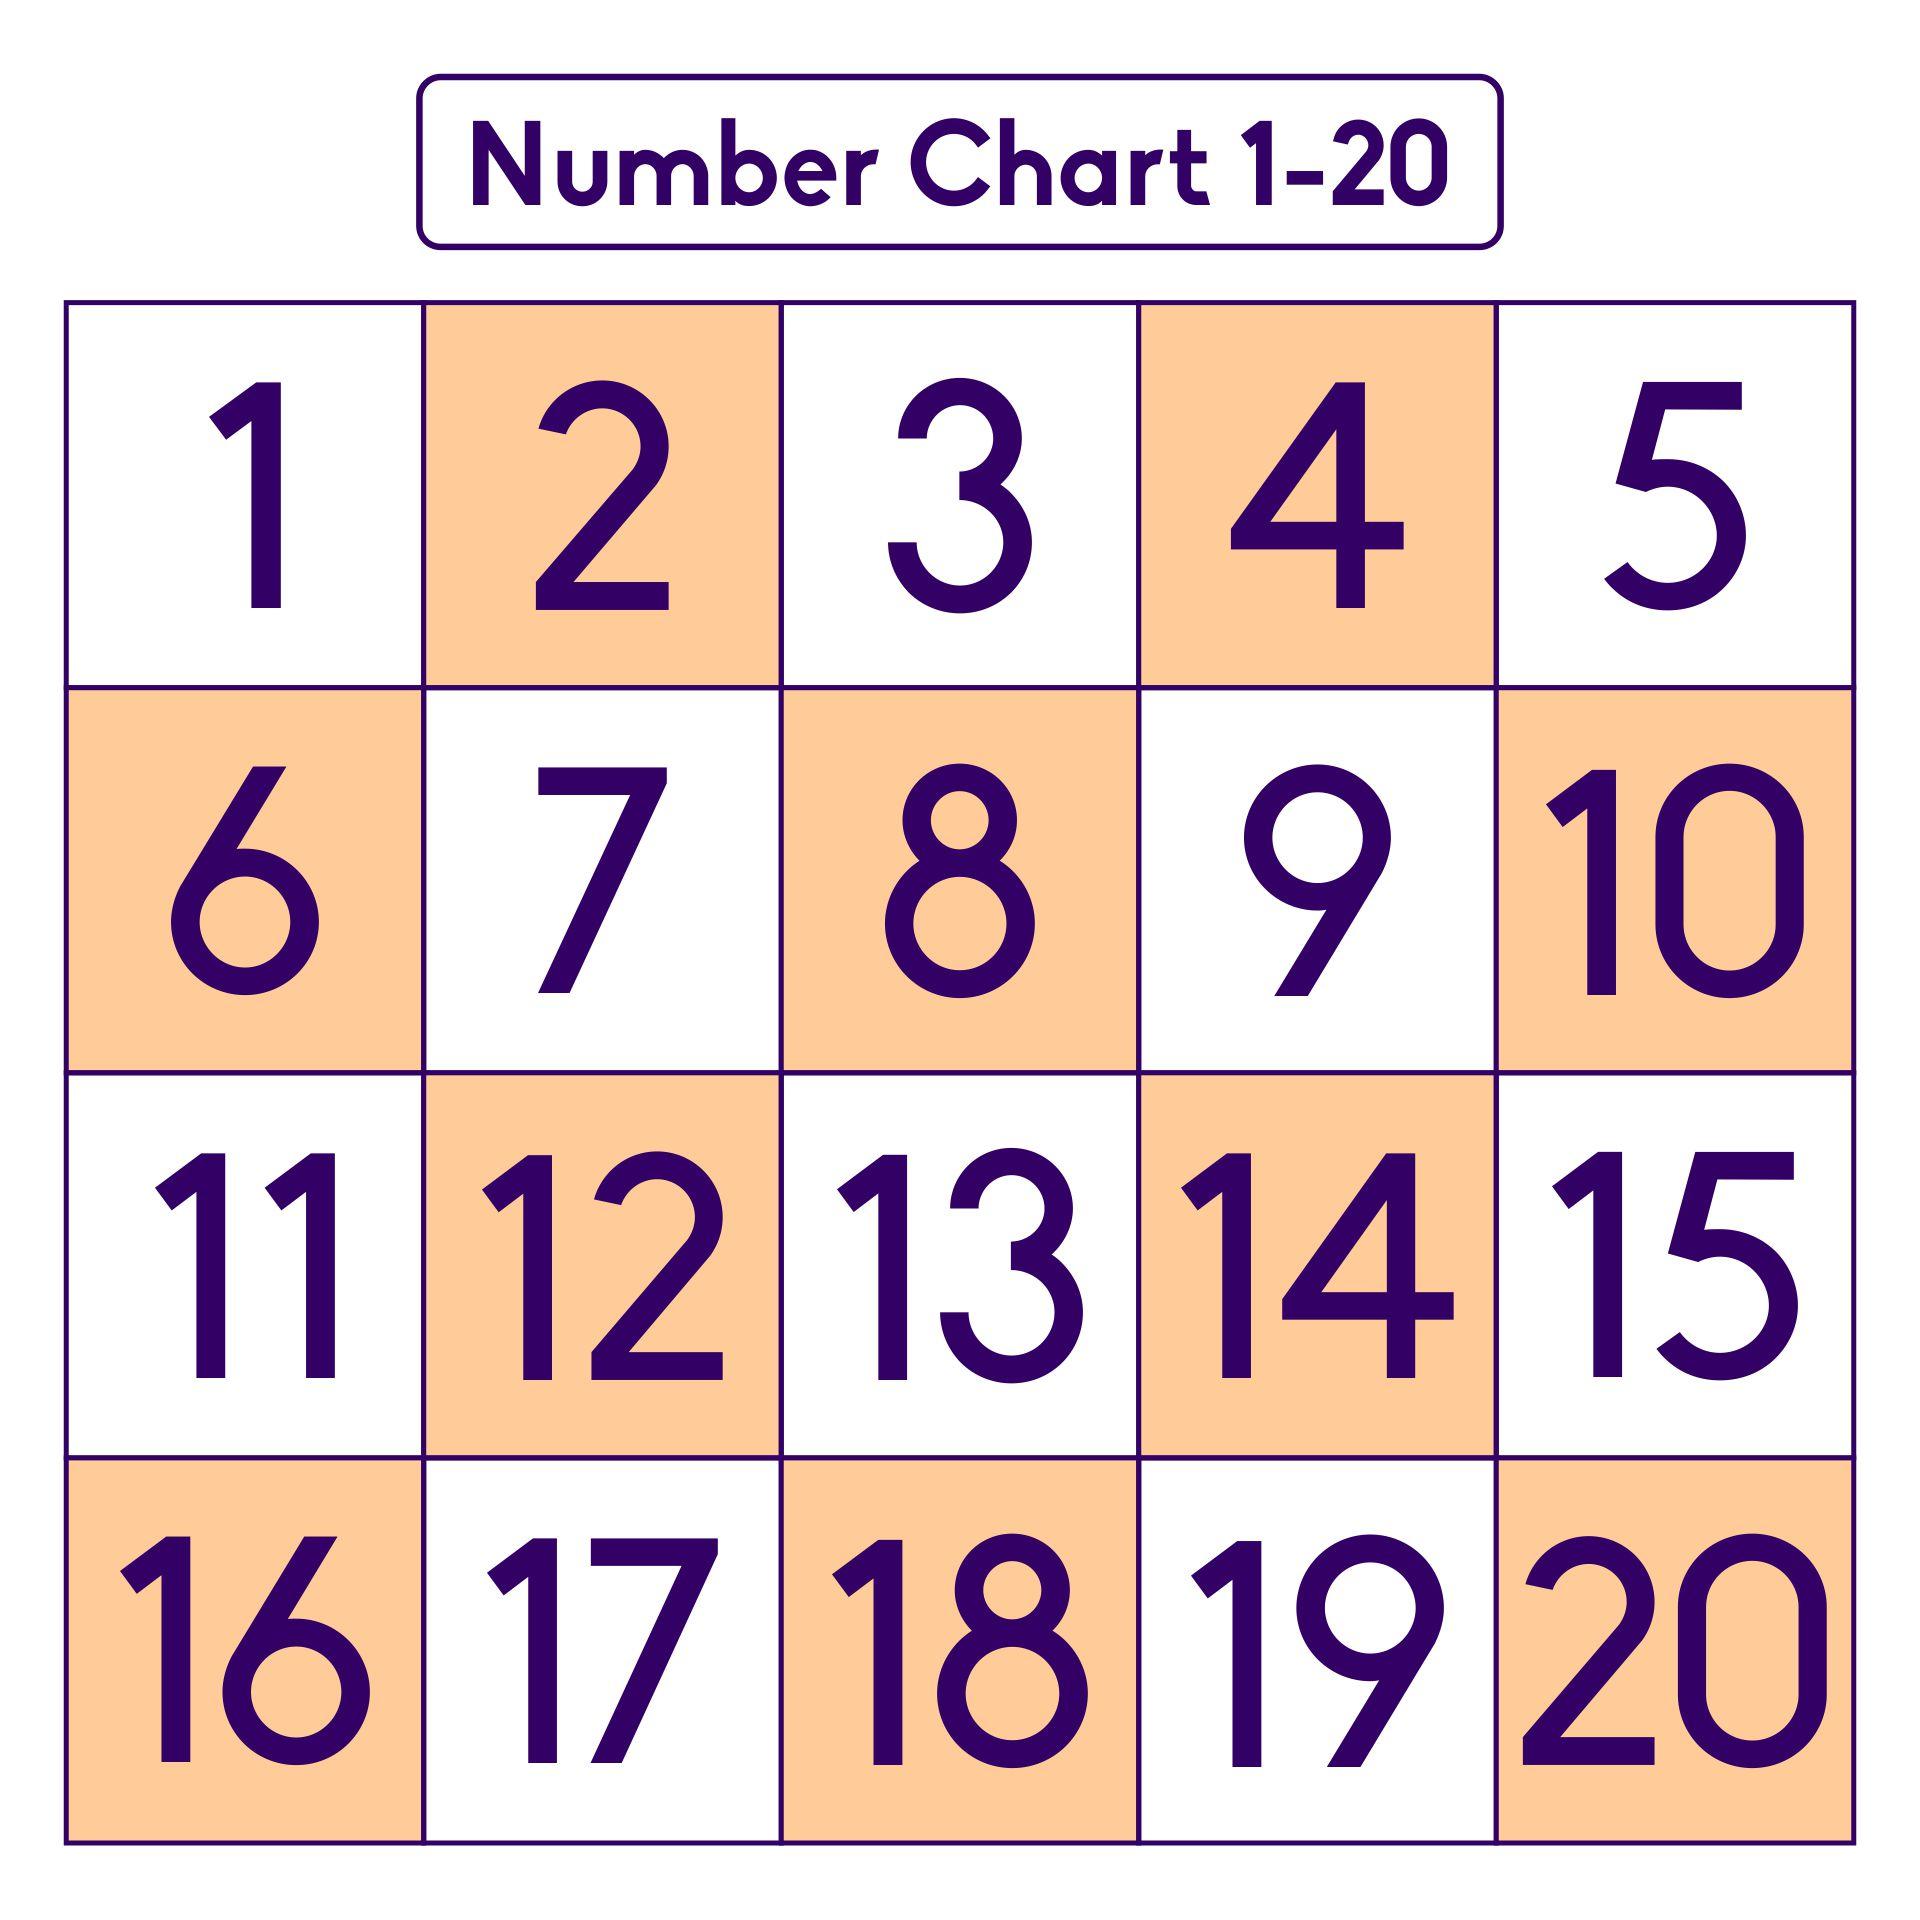 Number Chart 1 20 Printable